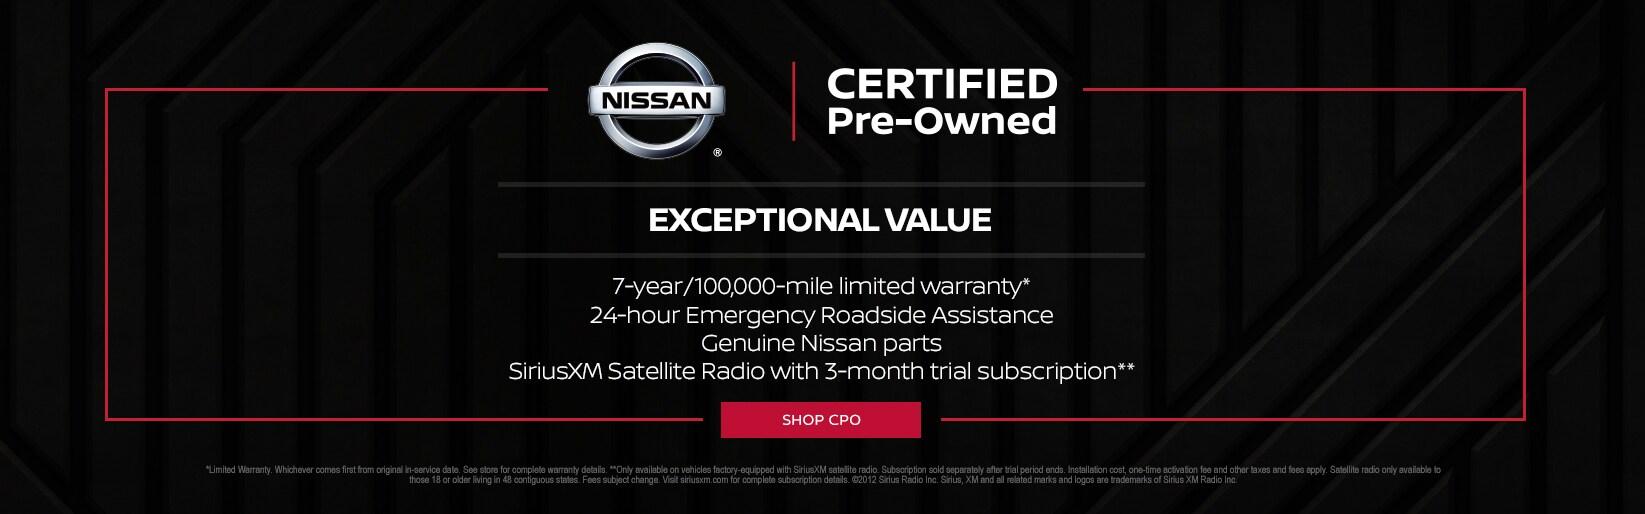 Nissan Dealership Near Me In Pembroke Pines | AutoNation ...